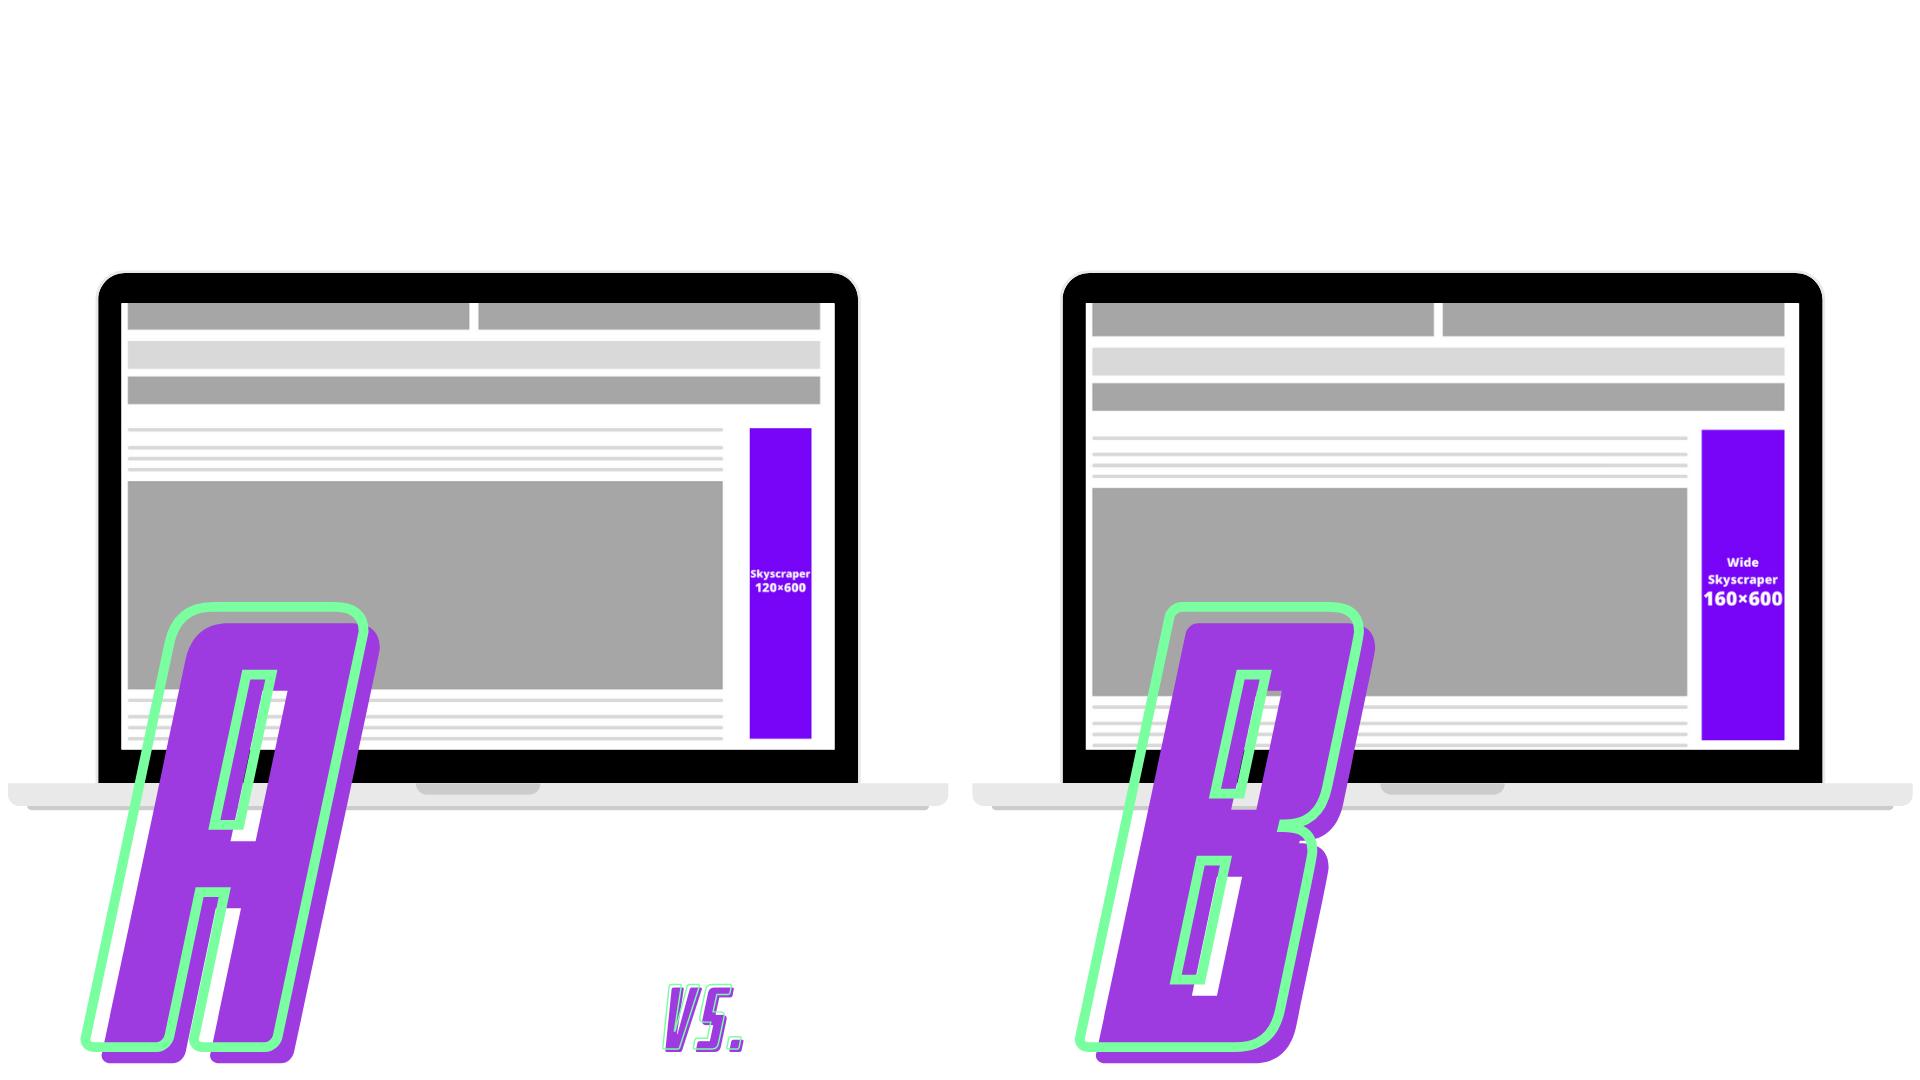 A/B testing display ad optimization